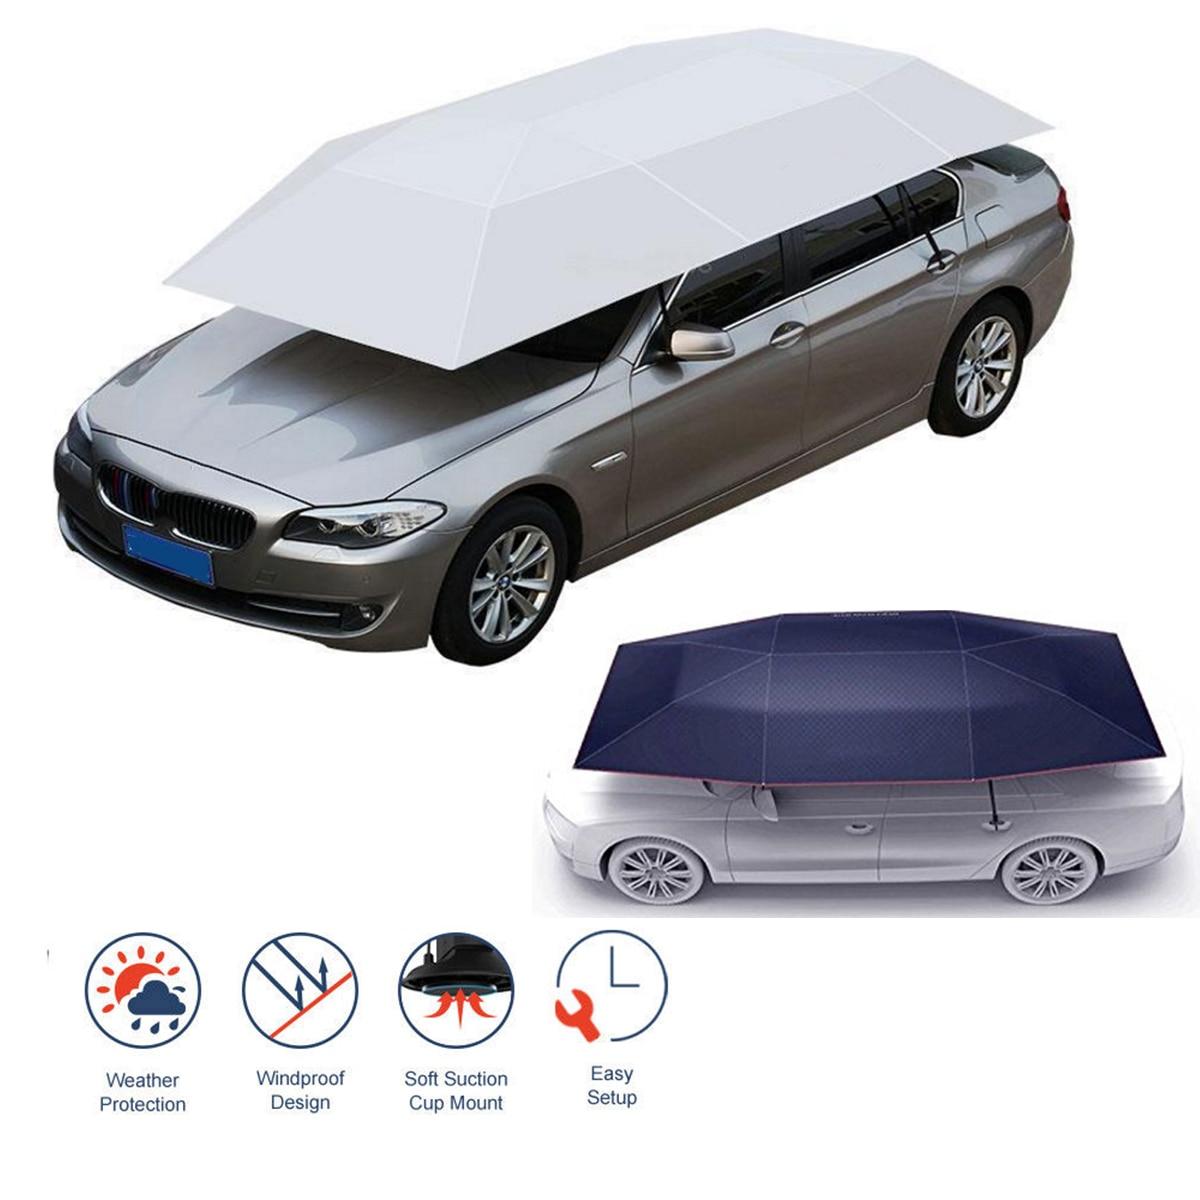 Semi-automatic Outdoor Car Vehicle Tent Umbrella Sunshade Roof Cover Anti-UV Kit Car Umbrella  Sun Shade